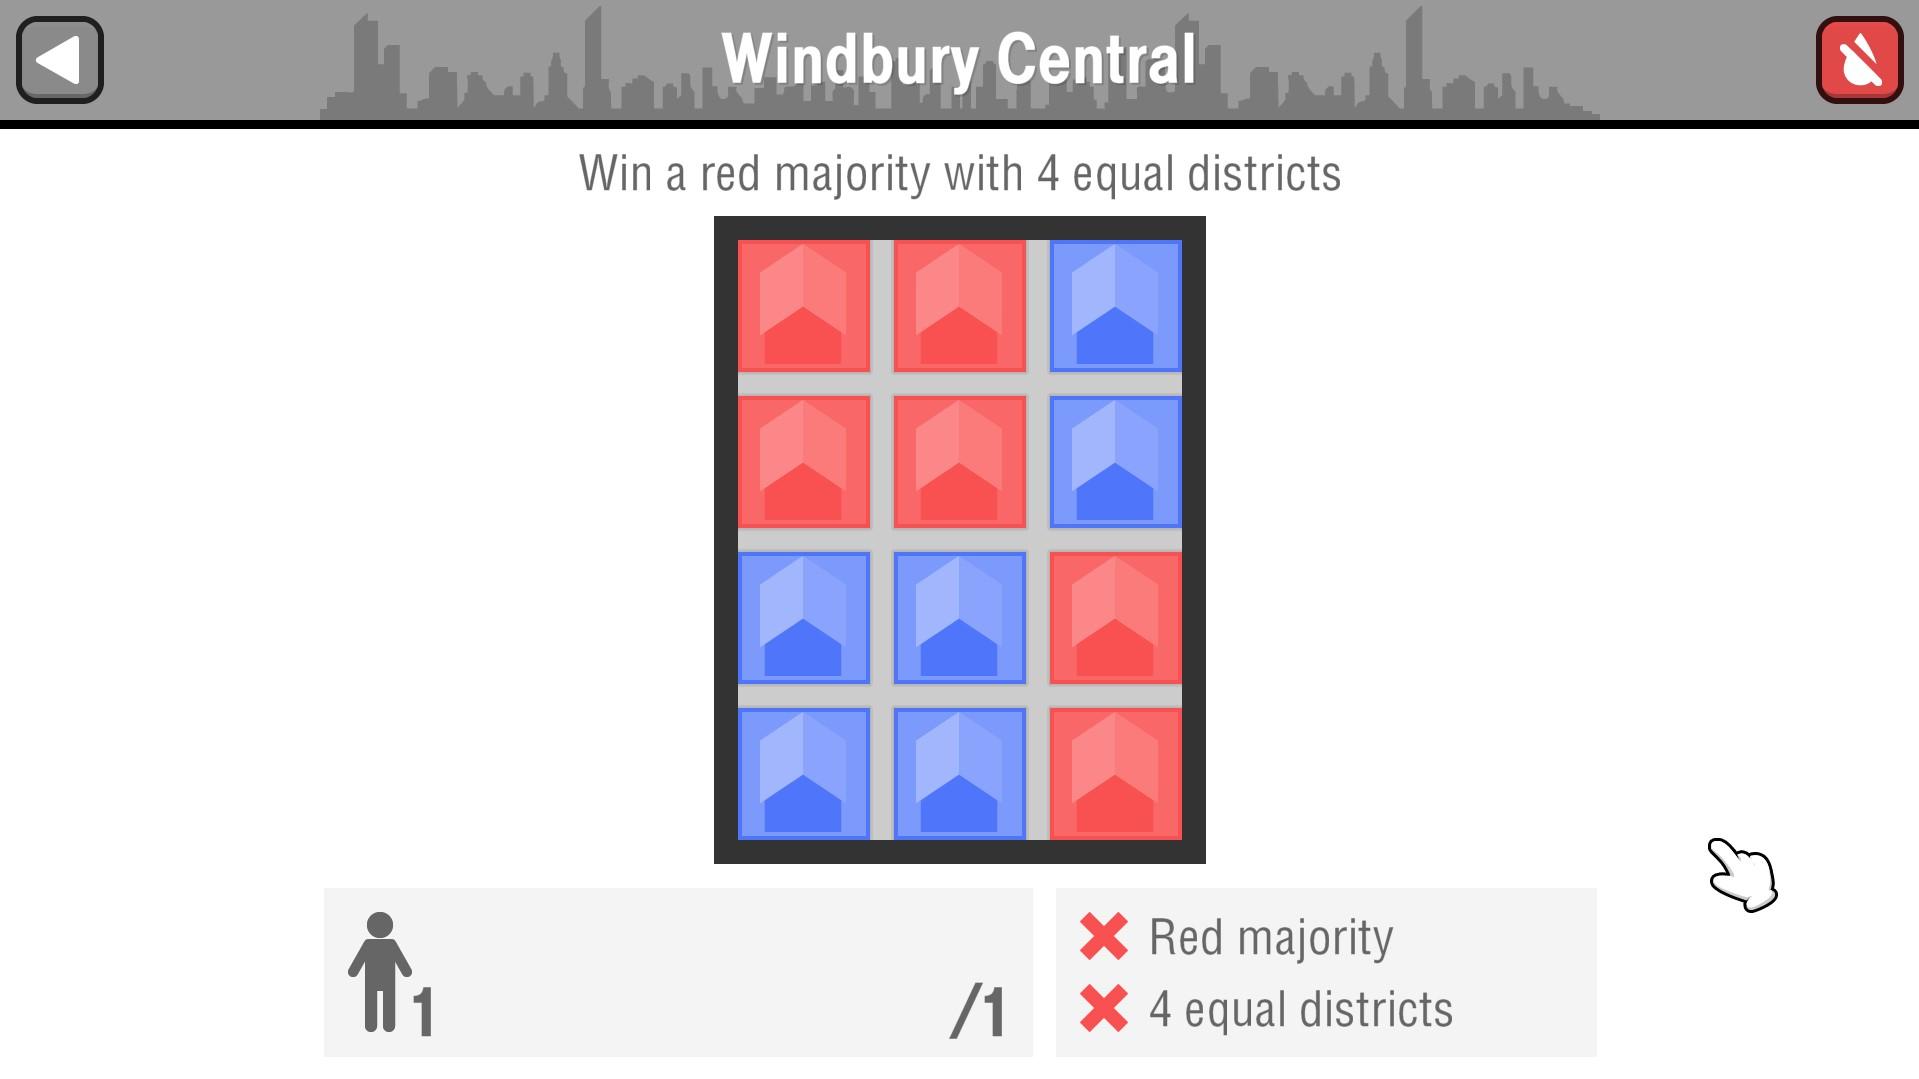 Windbury Central